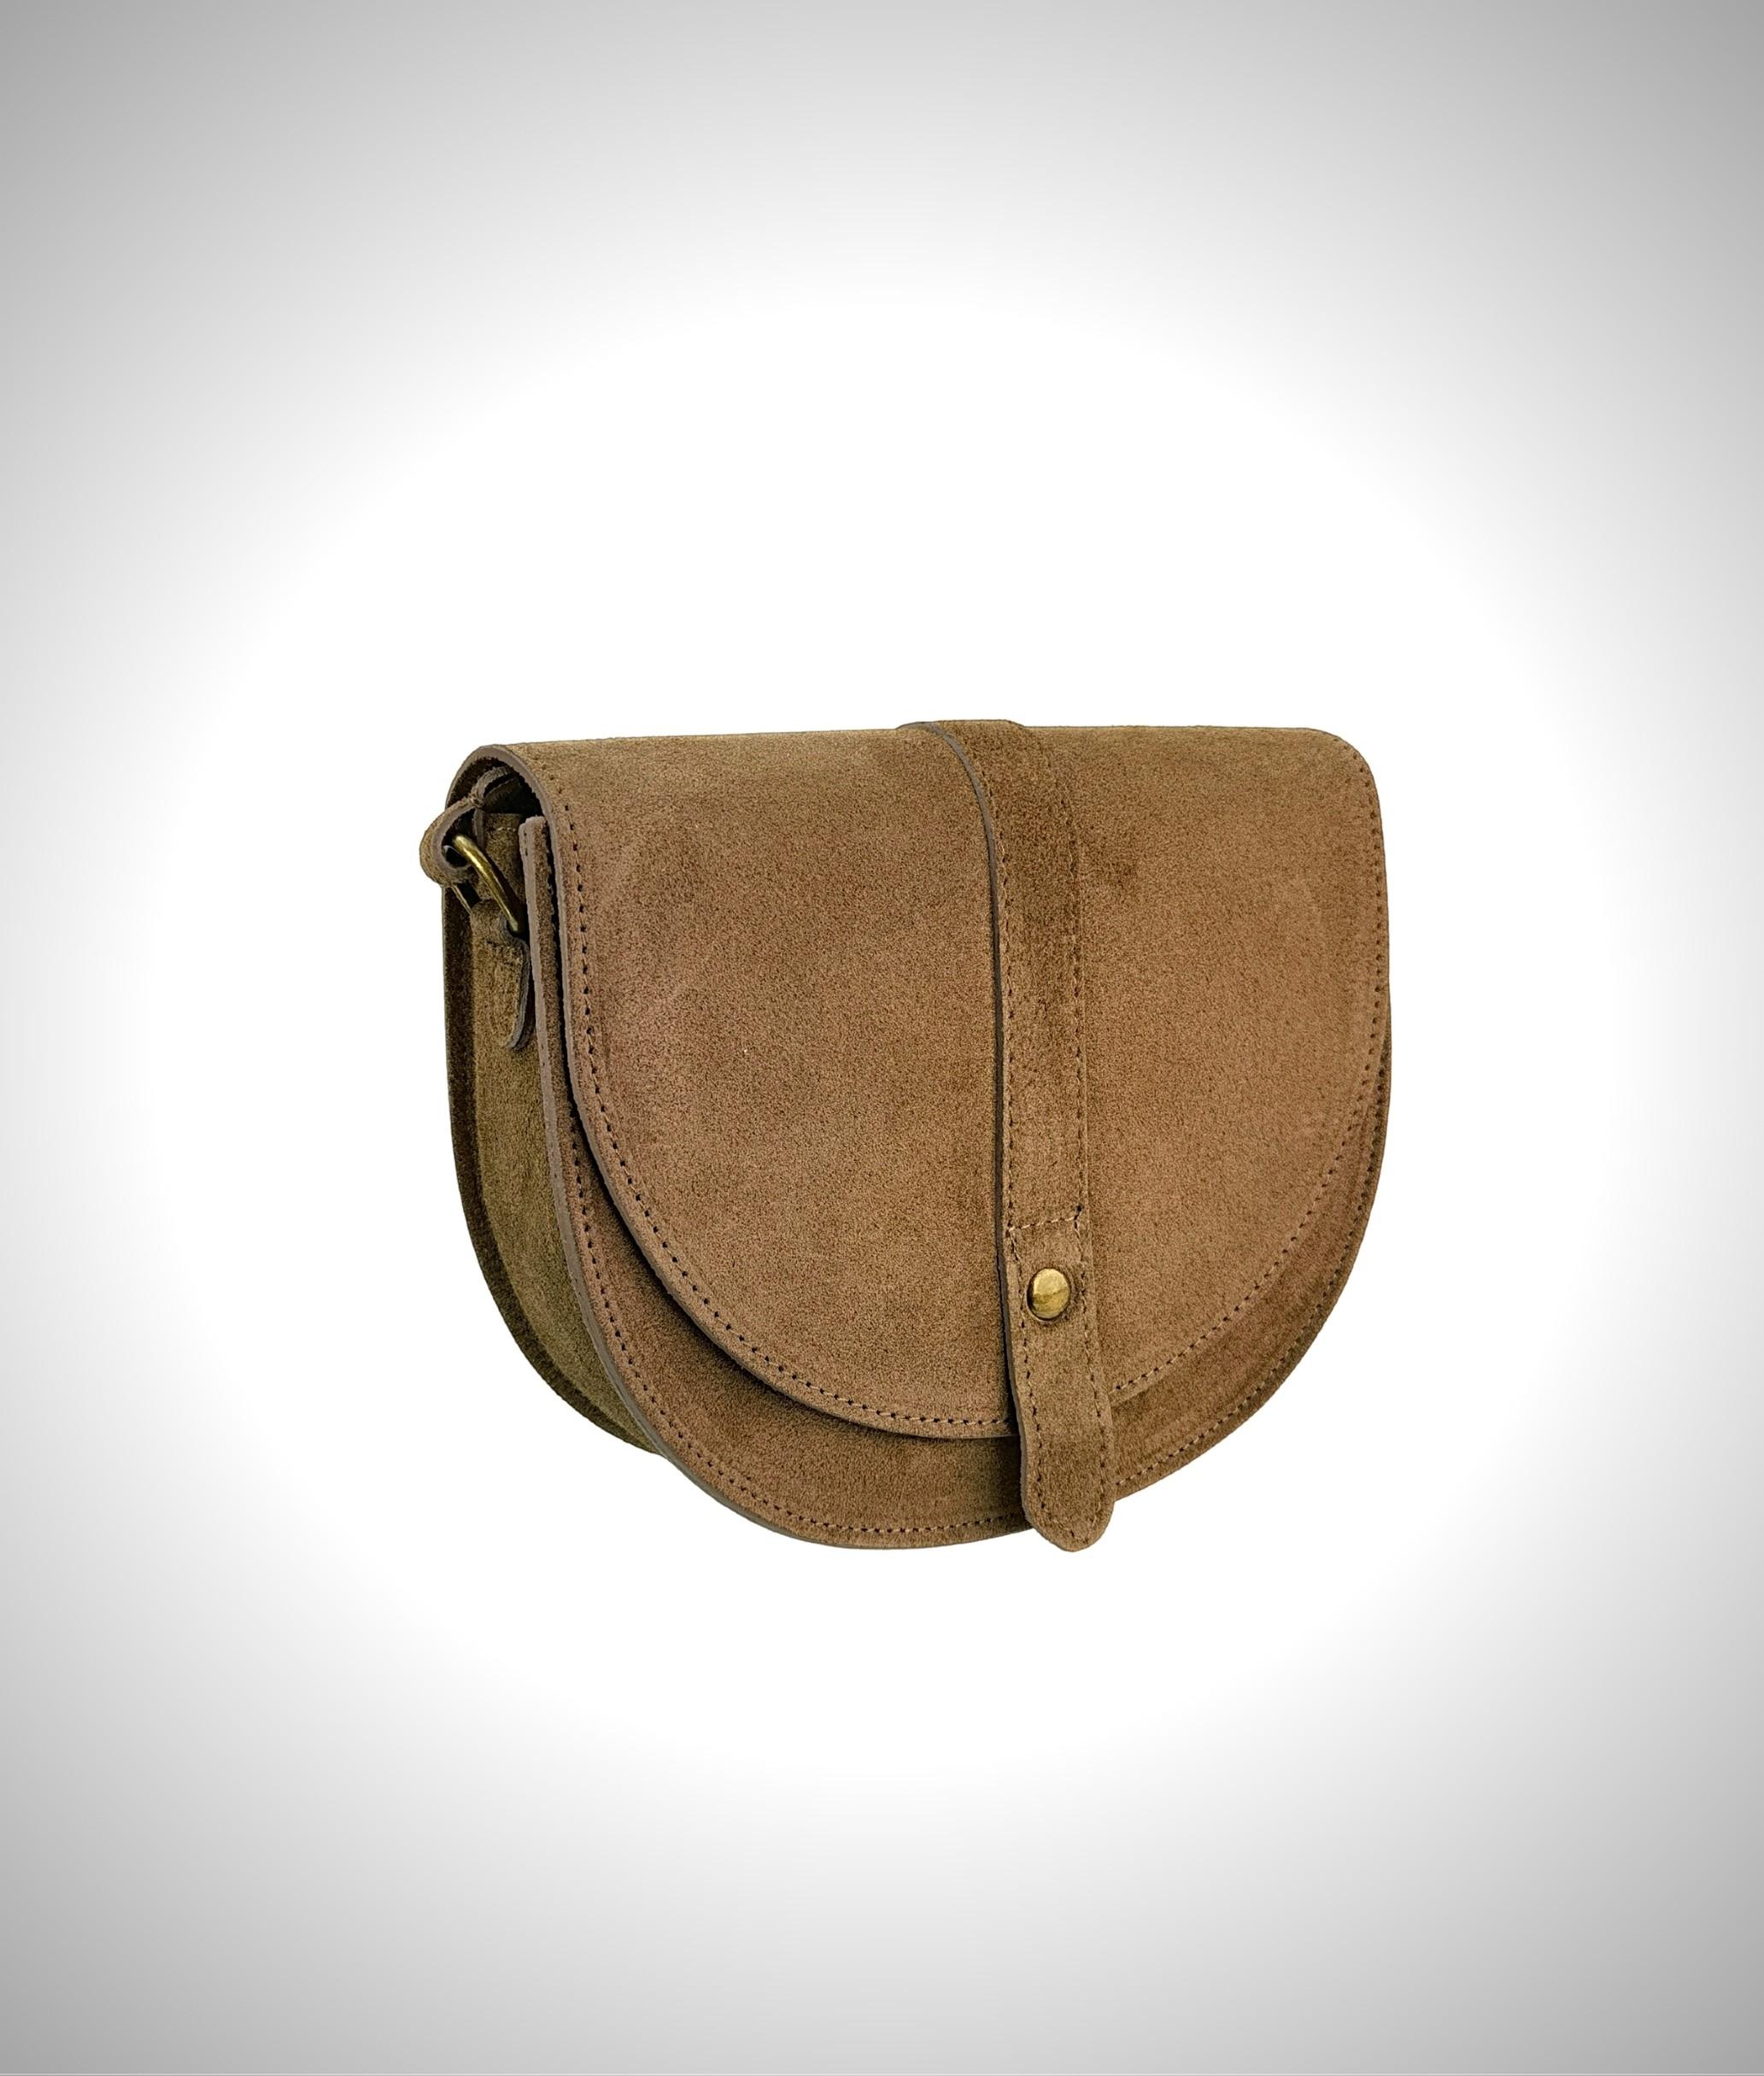 Leather crossbody bag Luna - taupe